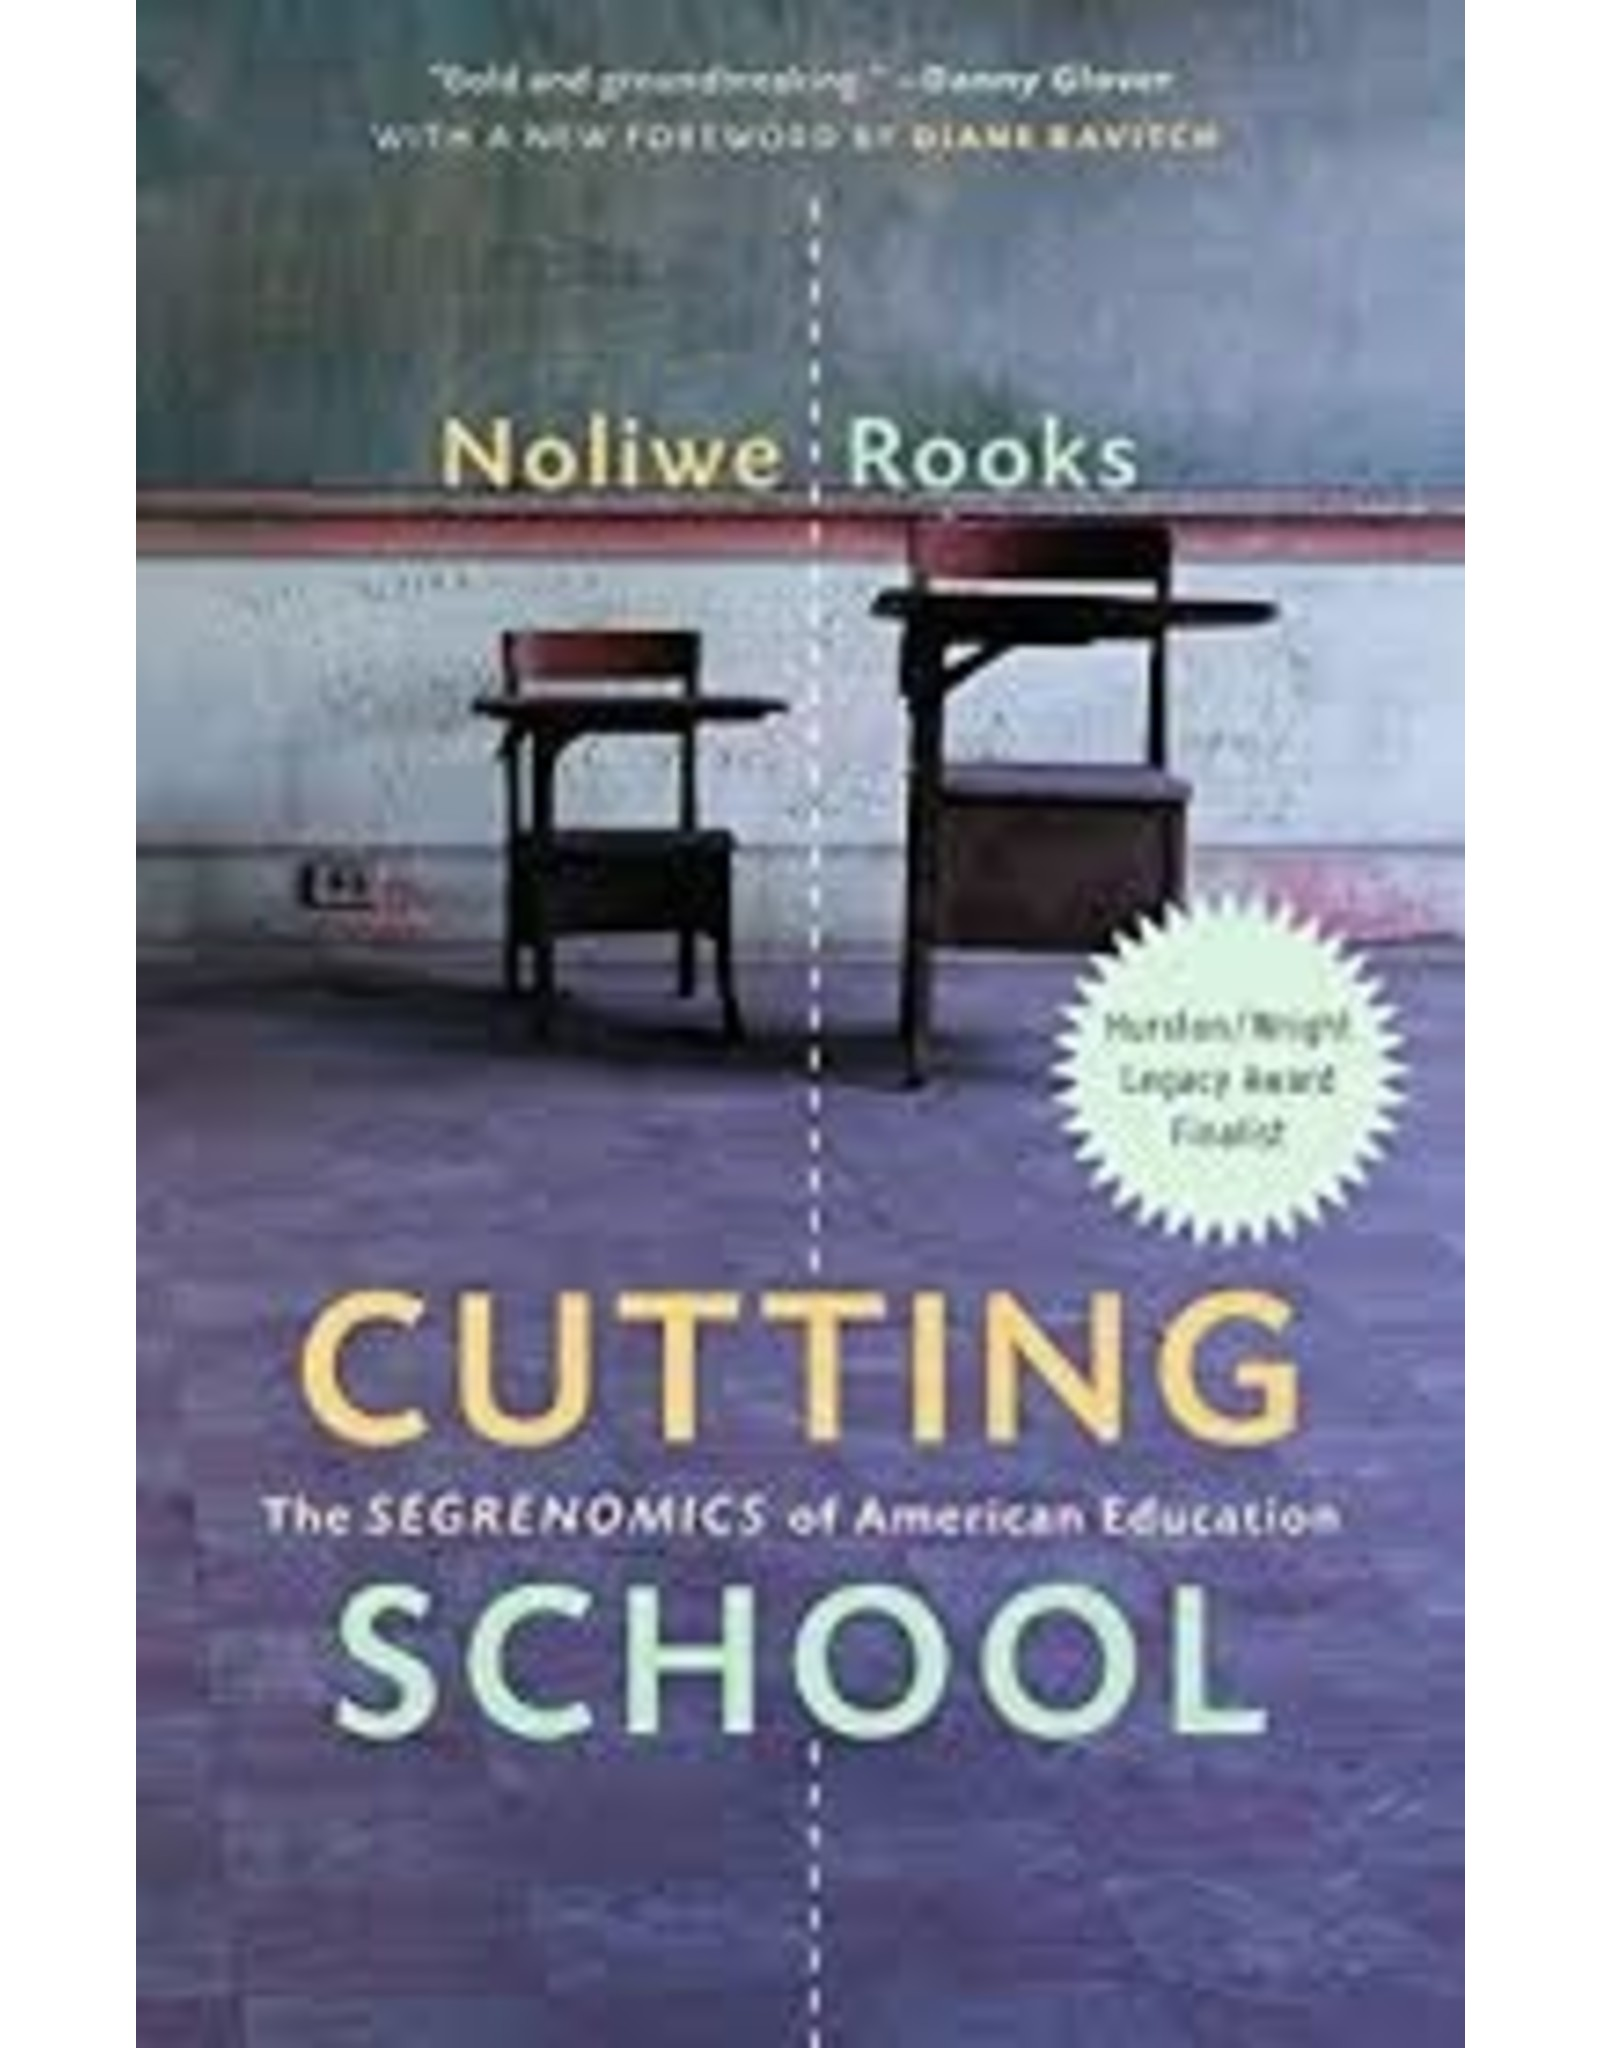 Books Cutting School: The Segrenomics of American Education by Noliwe Rooks